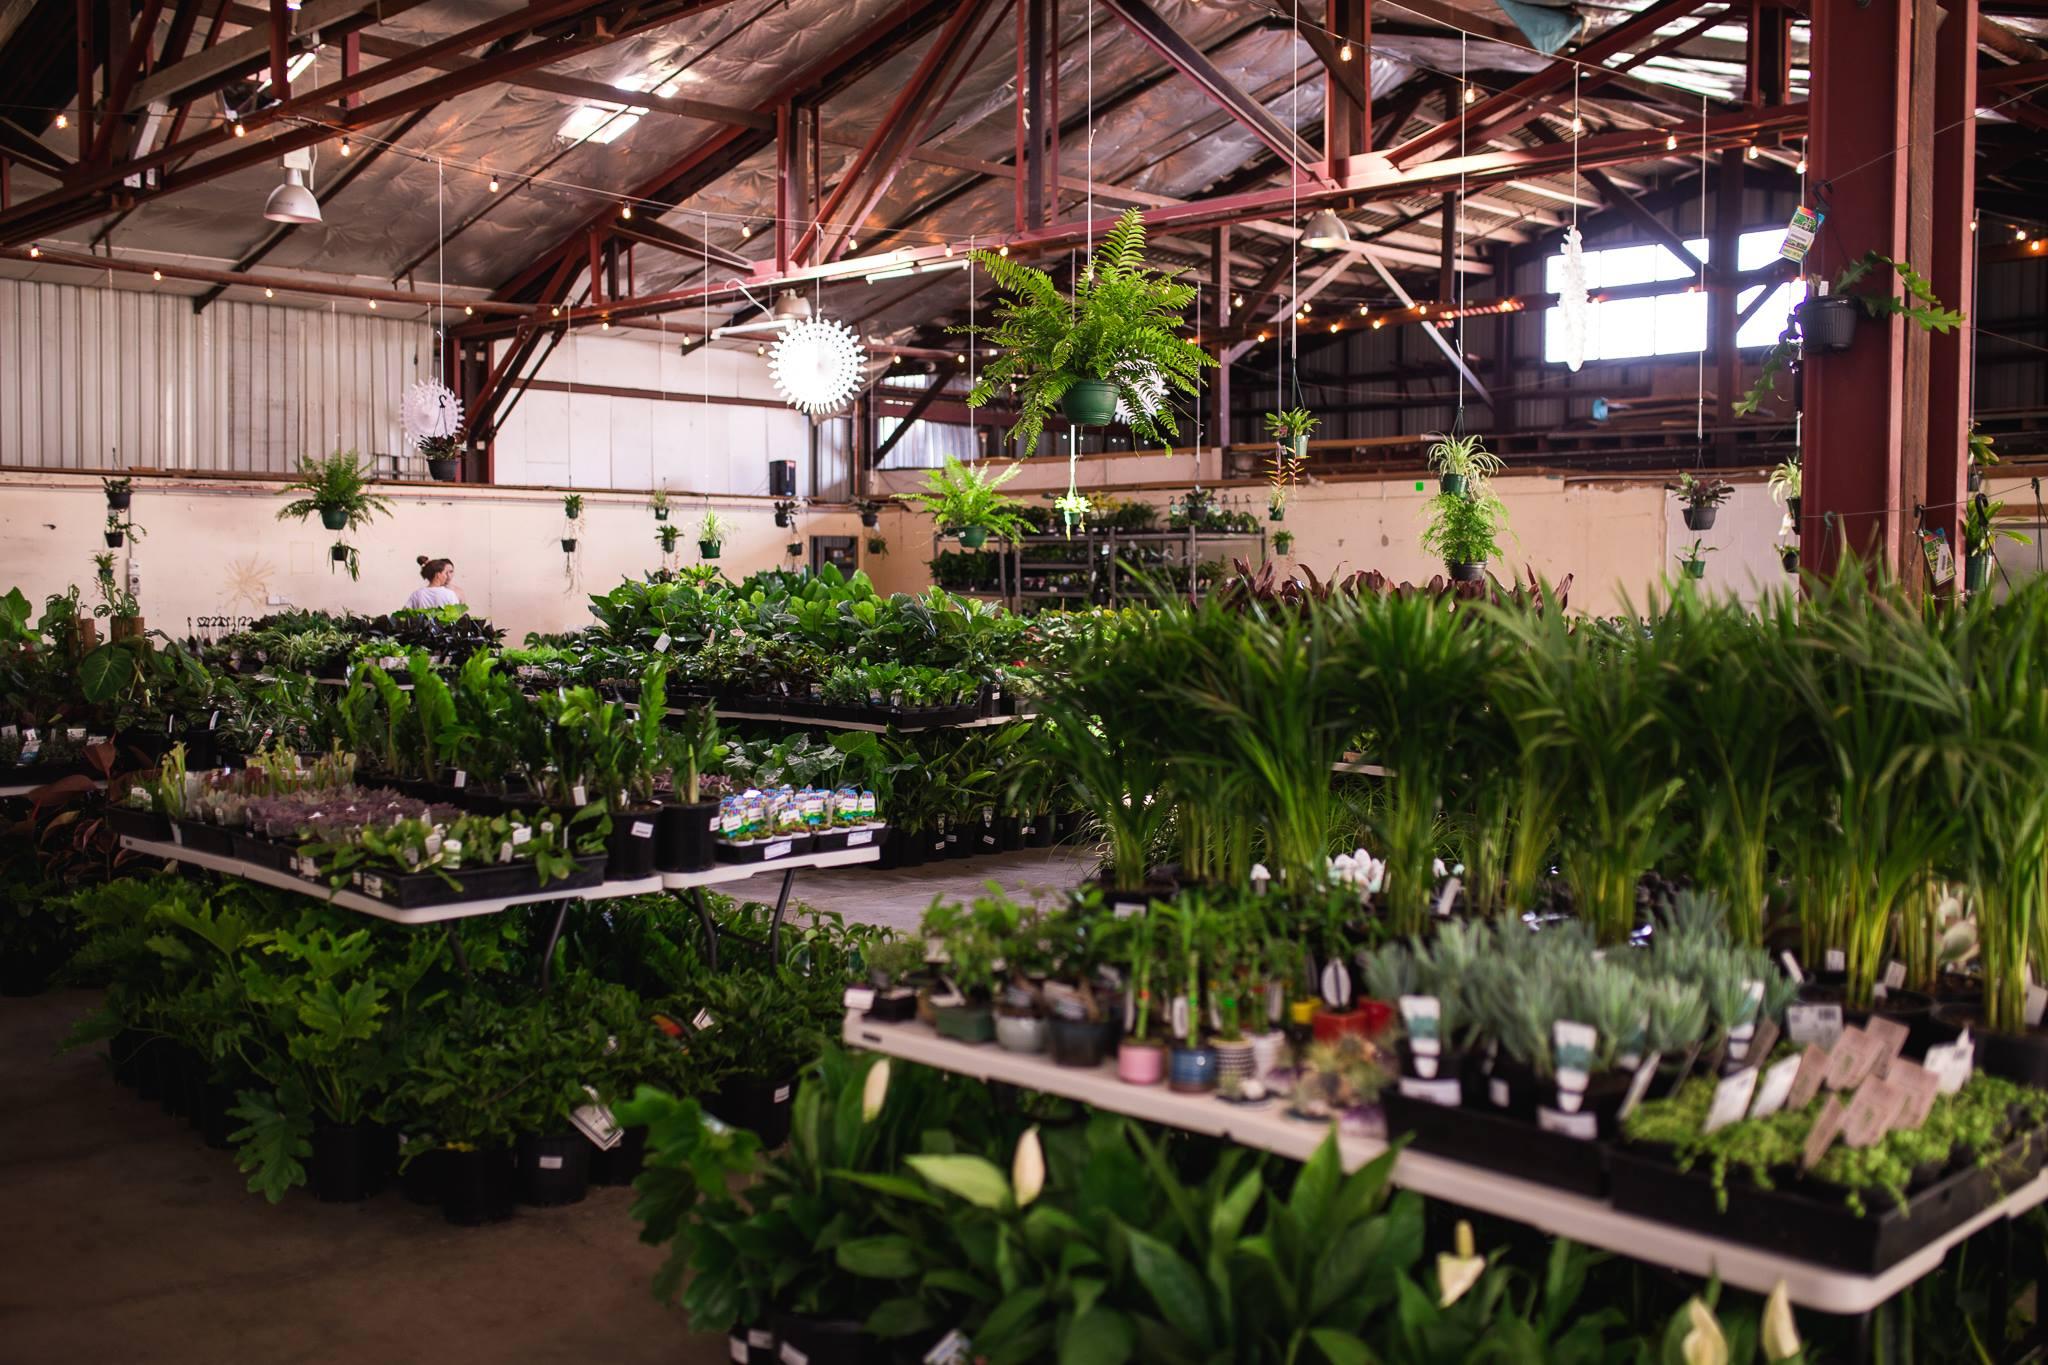 Huge Indoor Plant Warehouse Sale - Jungle Plant Party - Brisbane, Central Queensland, Queensland, Australia